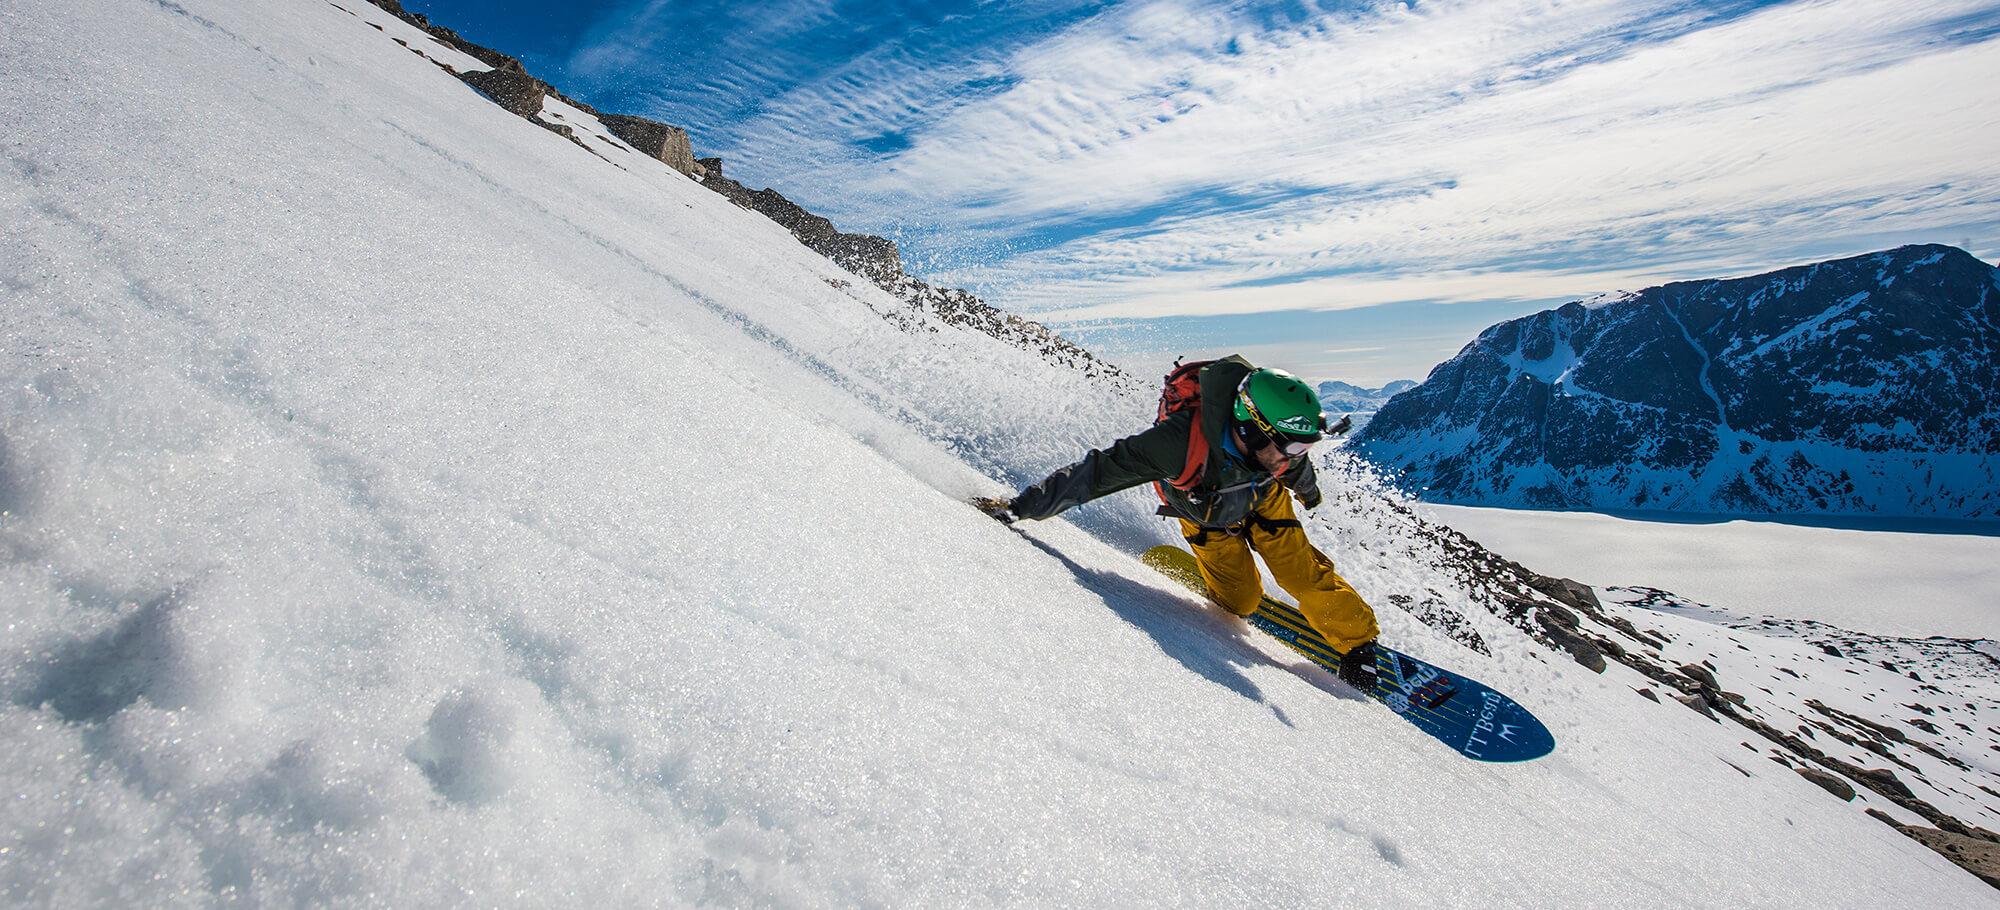 Snowboard-Action im neunen Warren Miller Skifilm